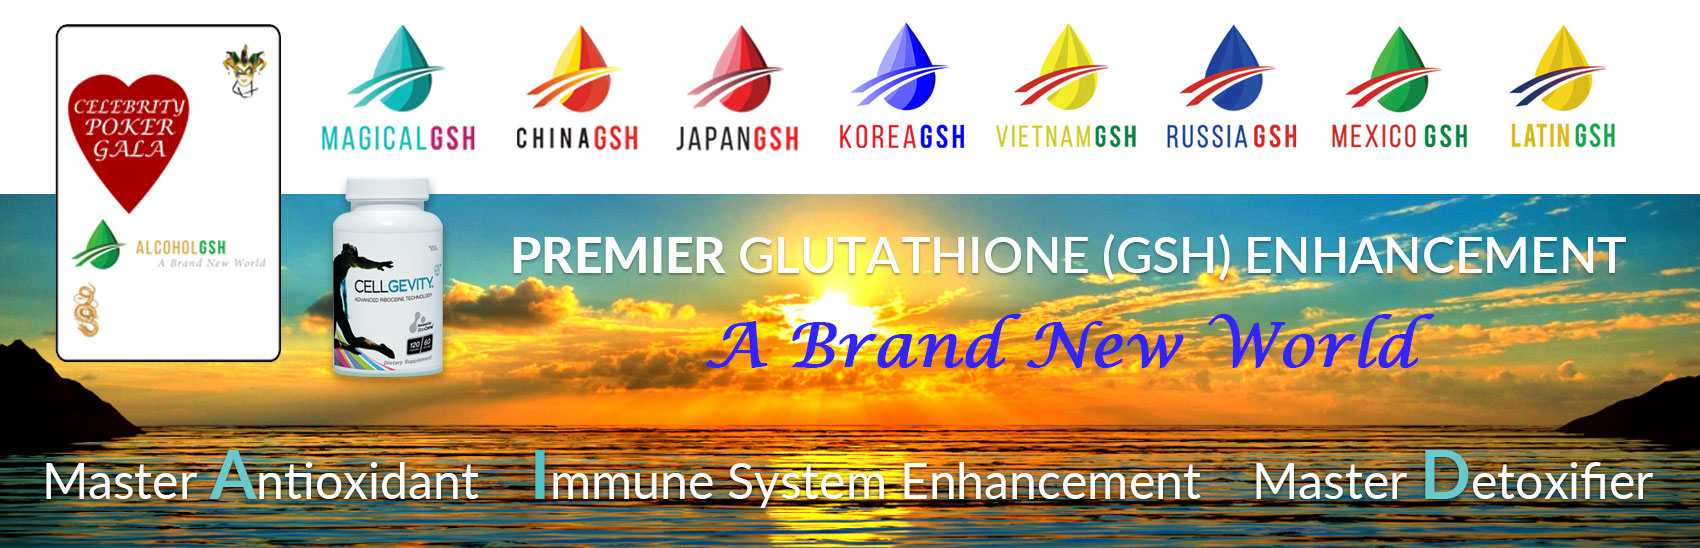 AGSH-Banner-4-15-2020-Master-Web-2